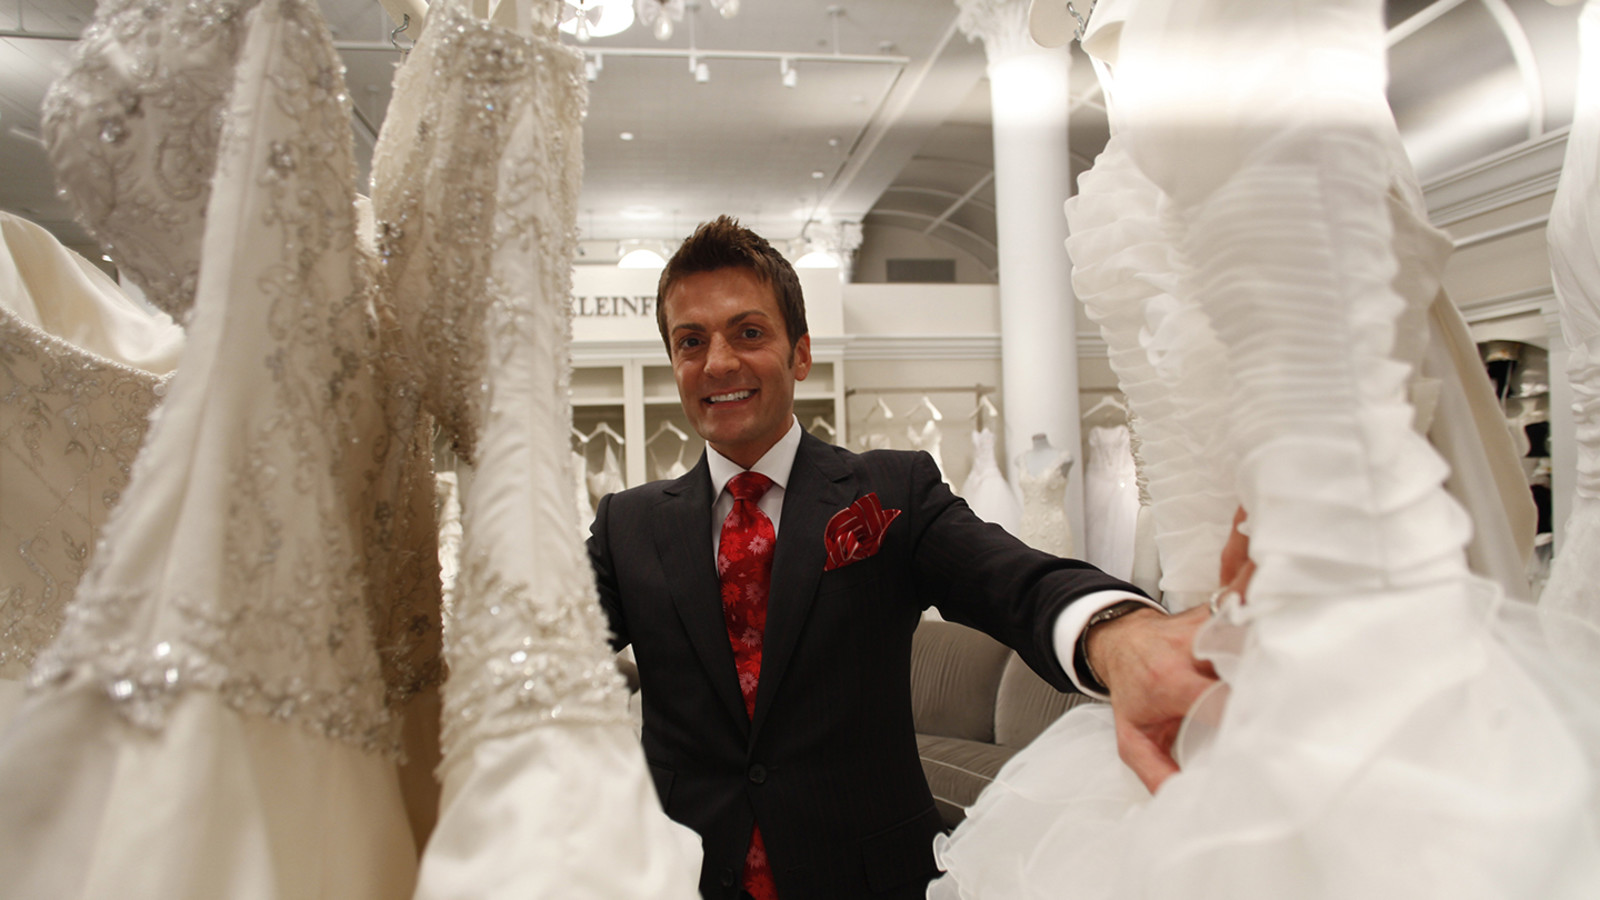 Vestidos de novia kleinfeld new york